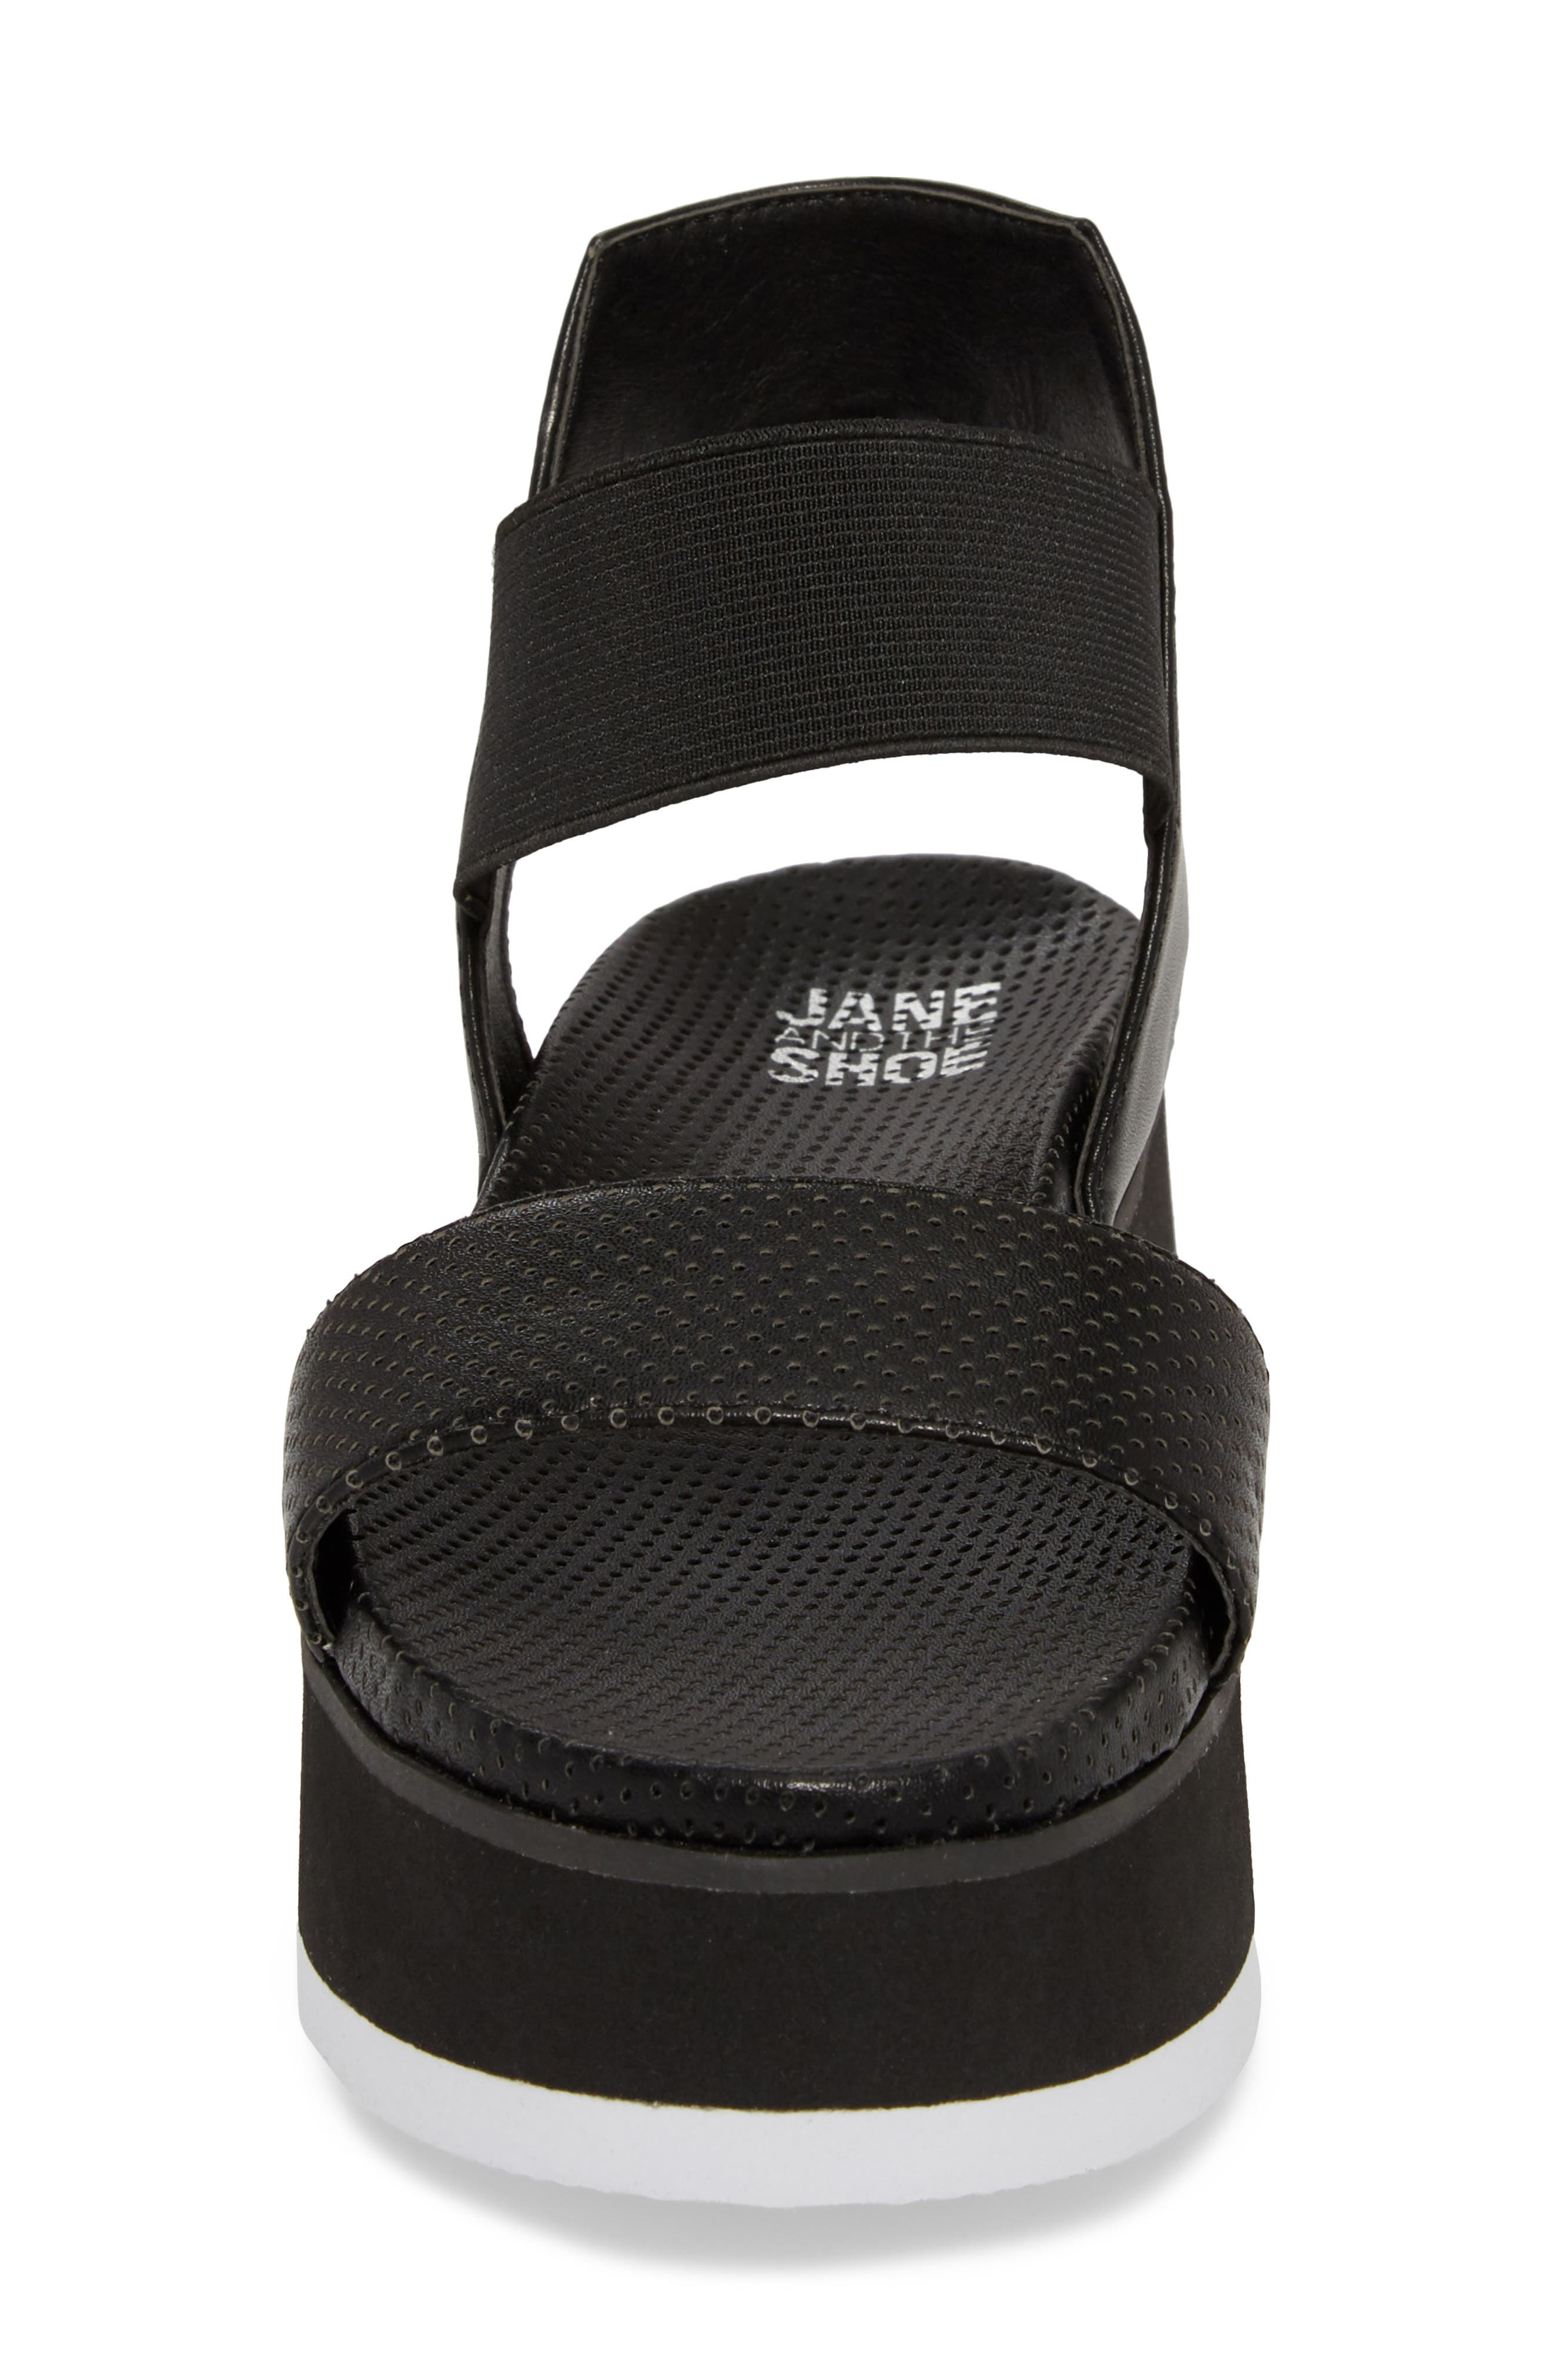 Josie Perforated Platform Sandal,                             Alternate thumbnail 4, color,                             BLACK